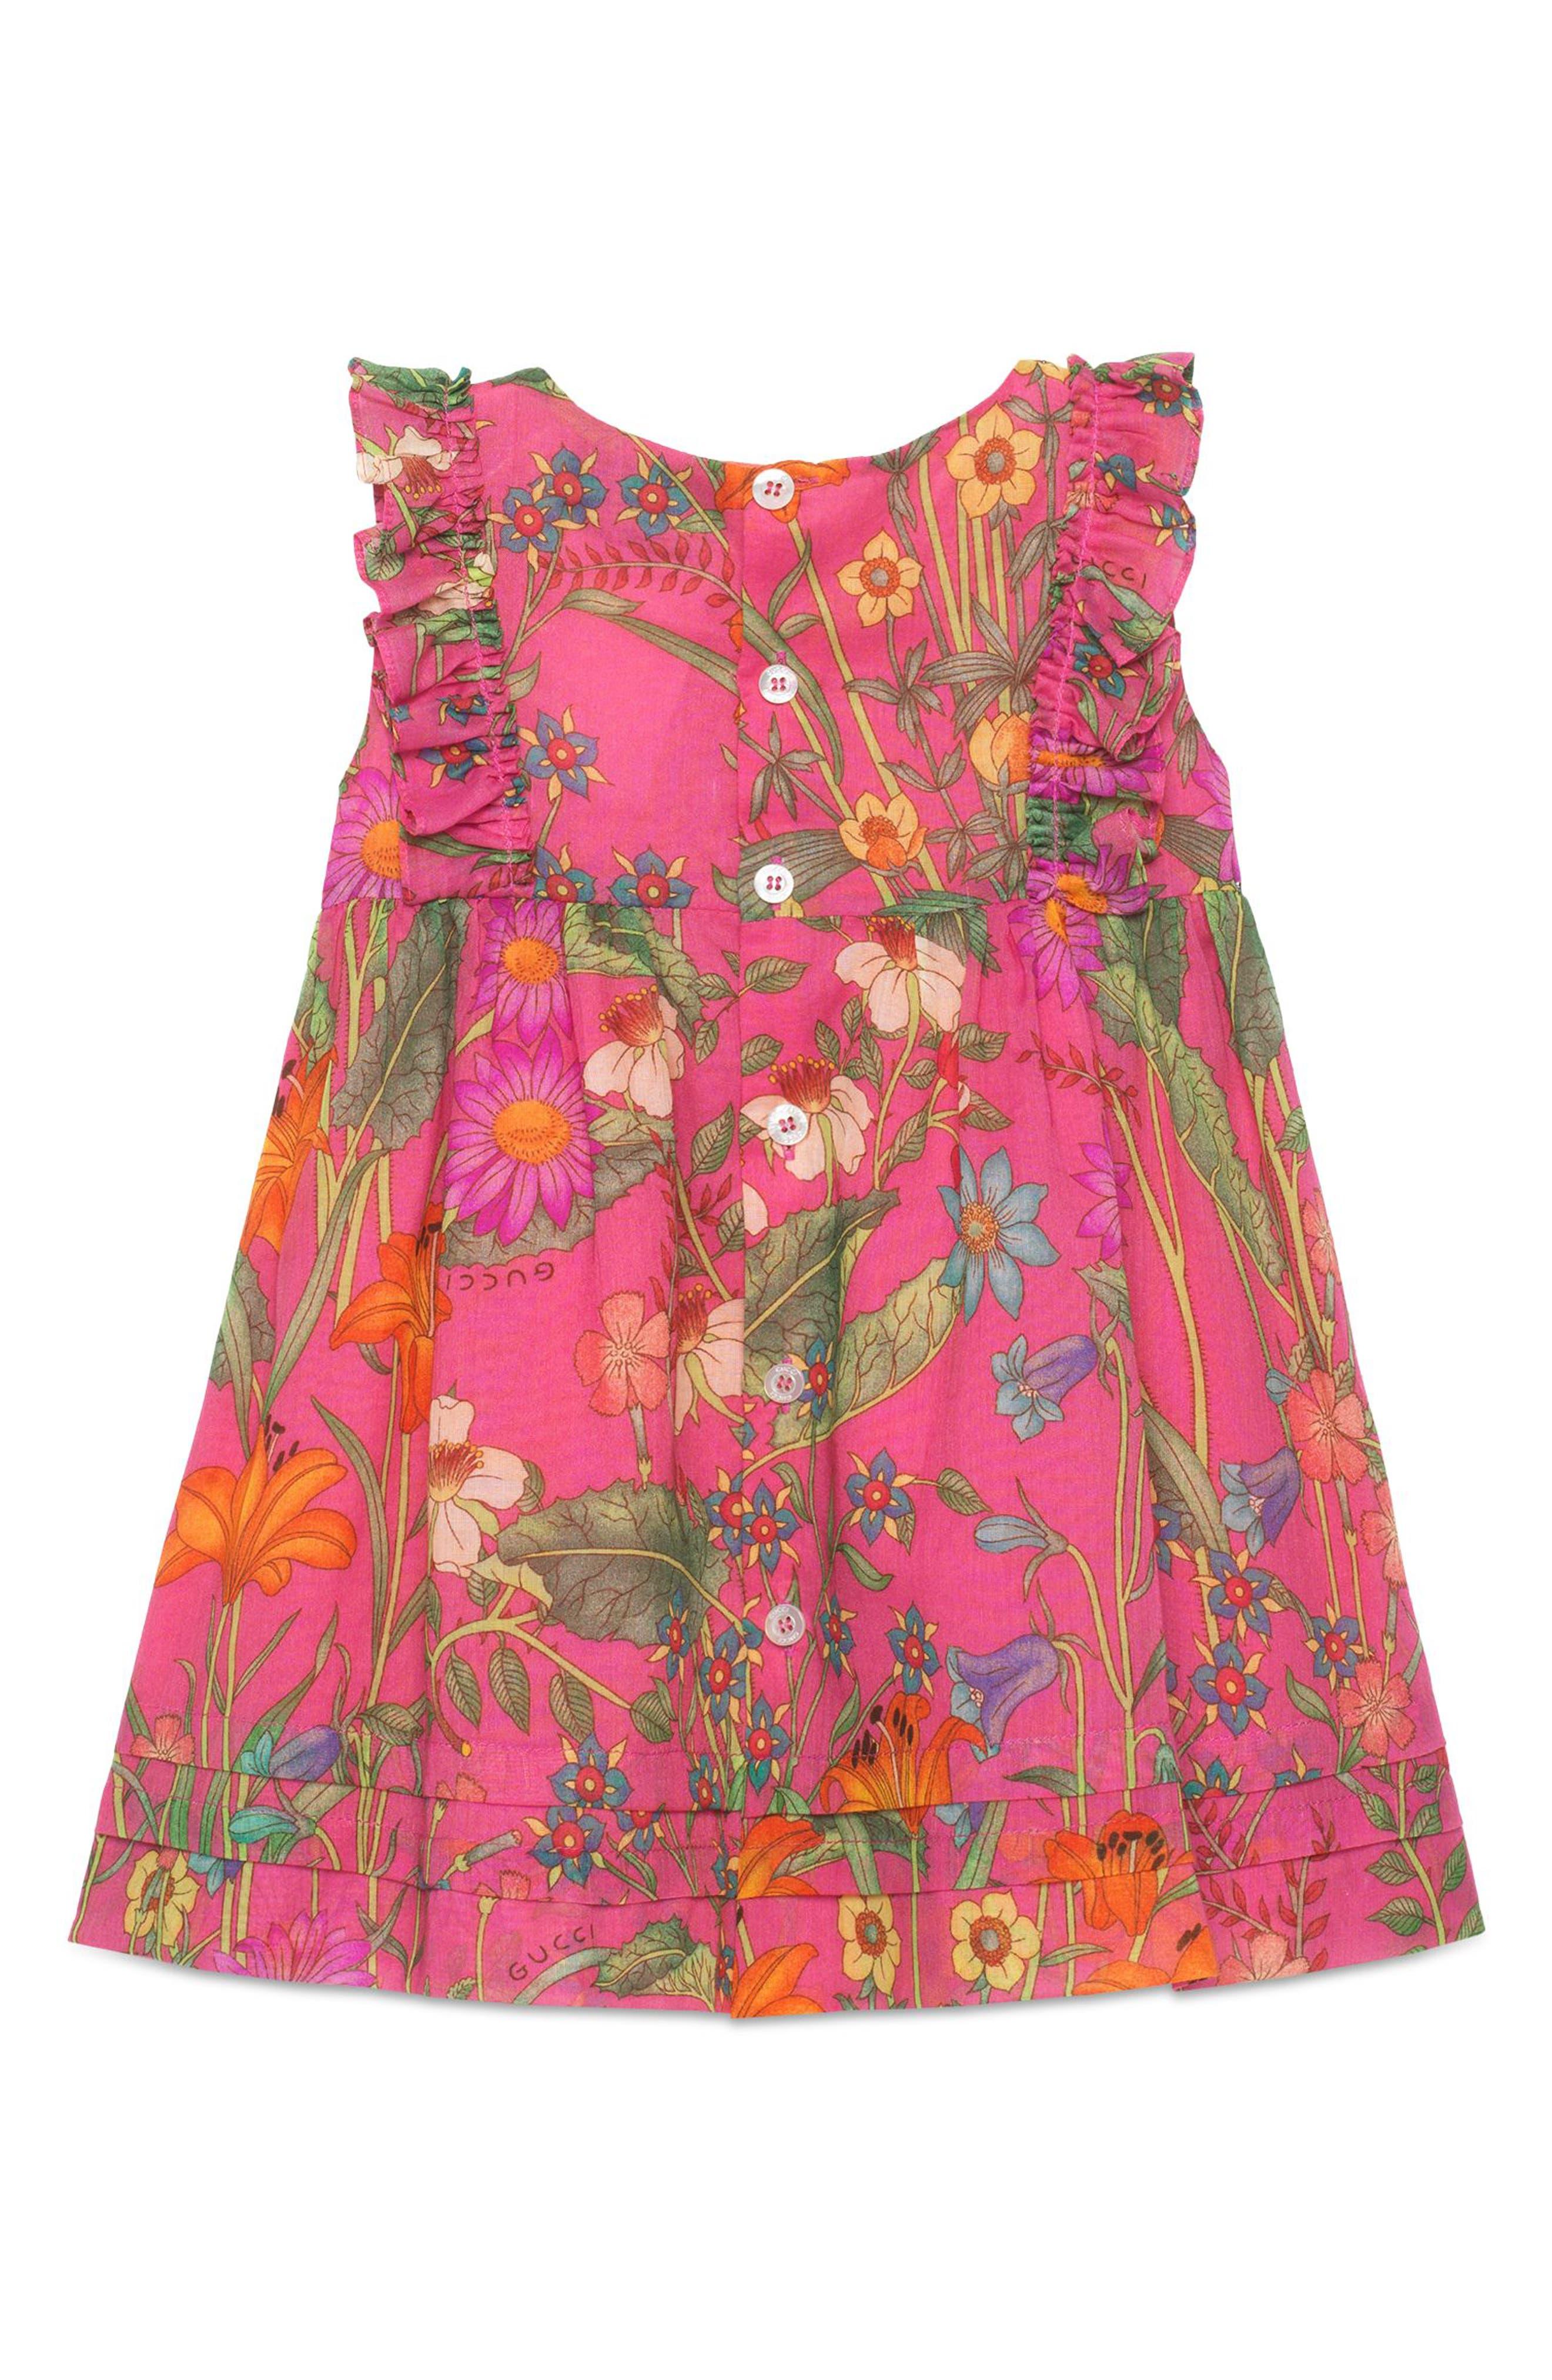 Floral Print Sleeveless Dress,                             Alternate thumbnail 2, color,                             POWER ROSE